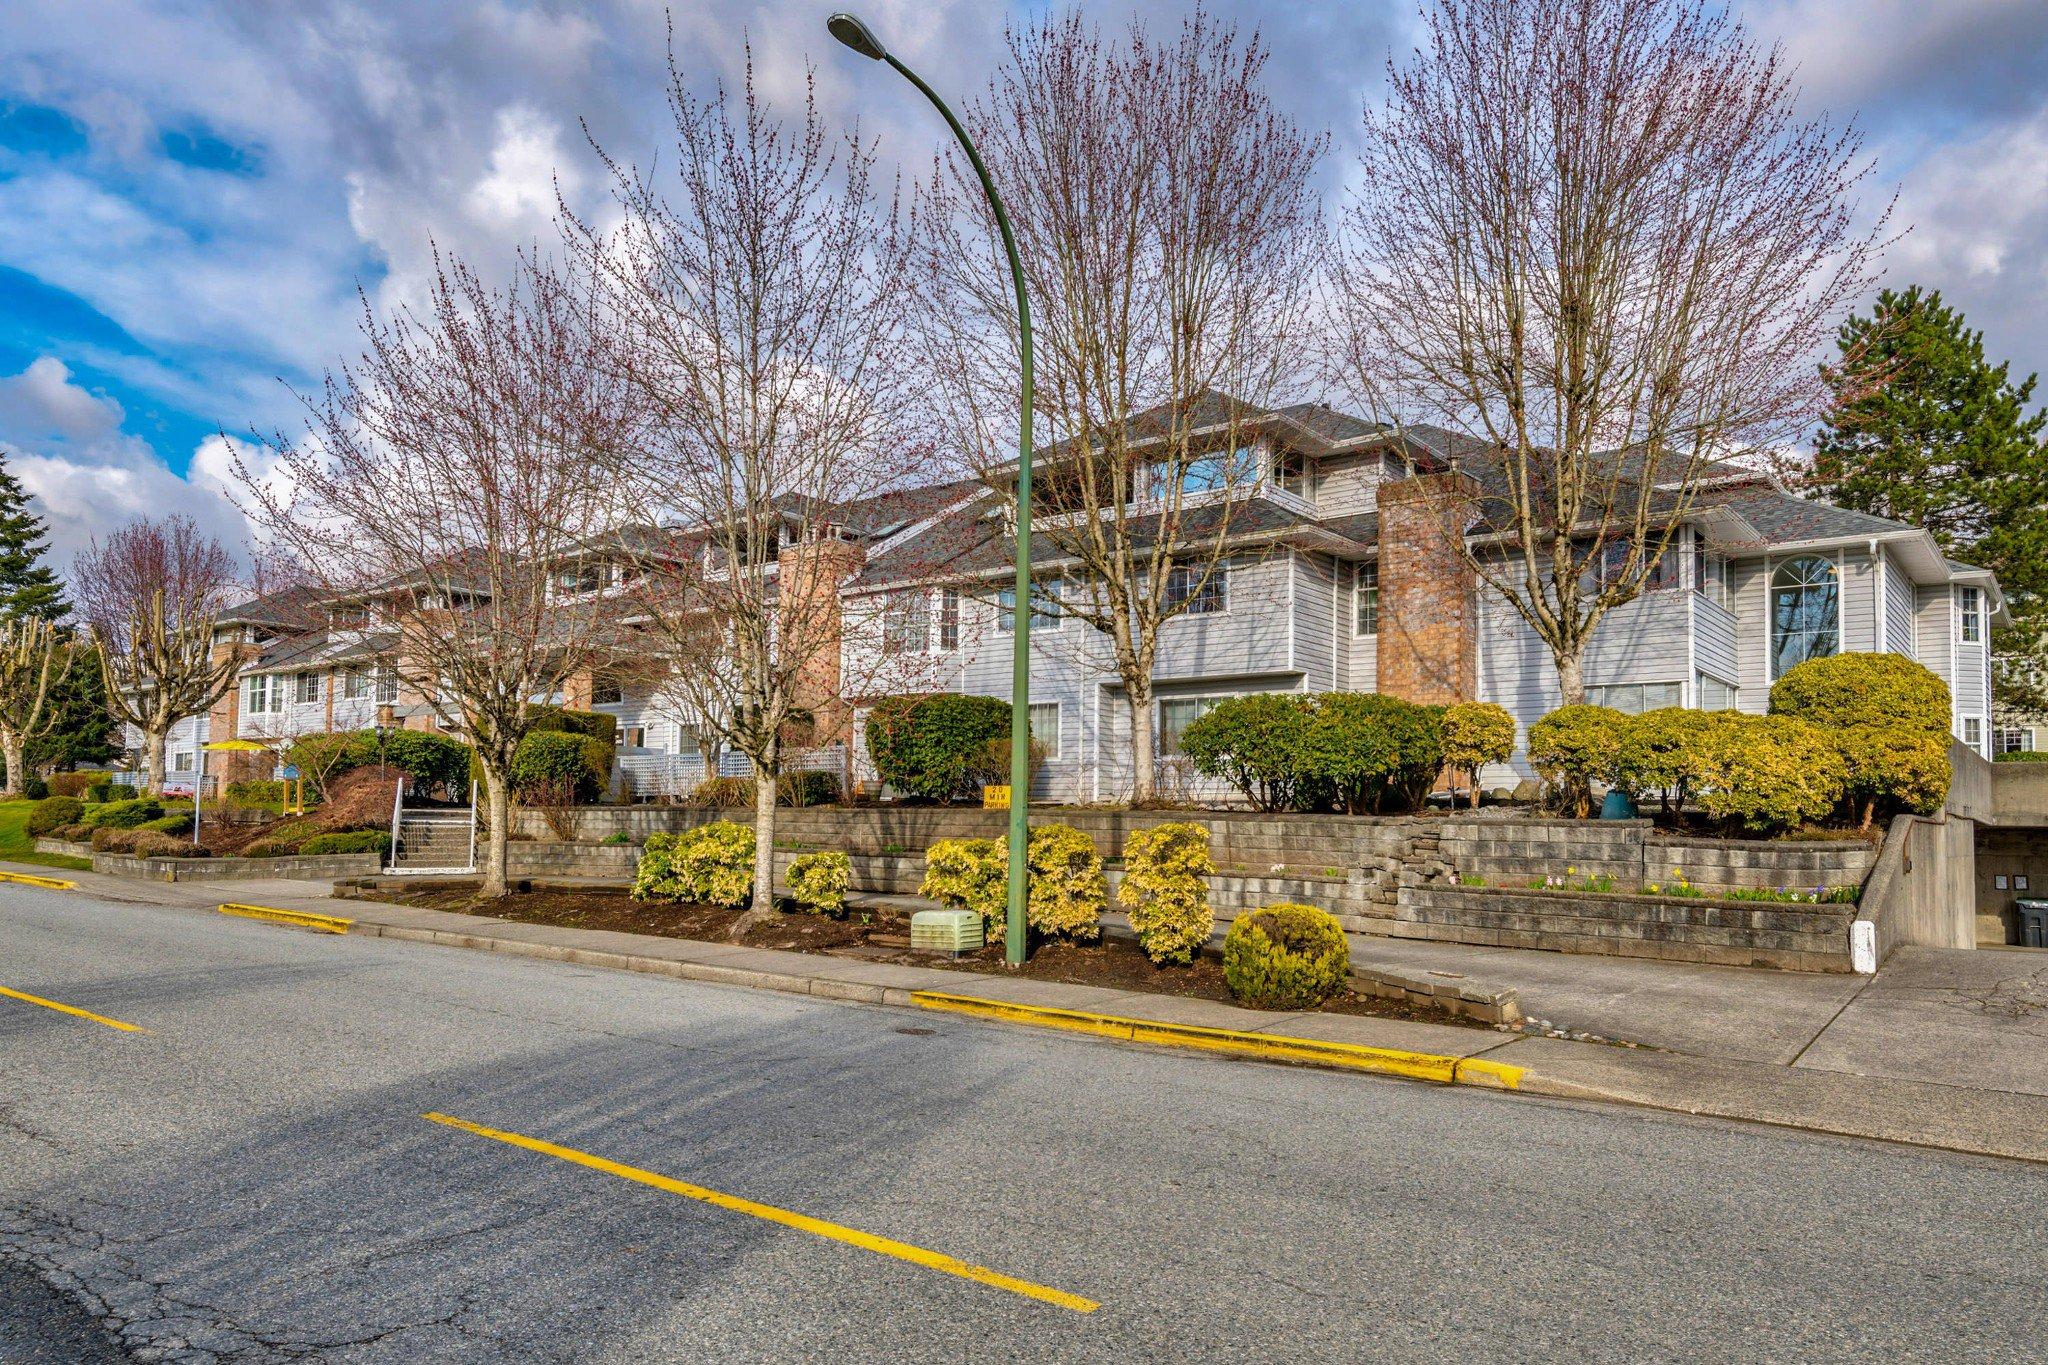 Photo 3: Photos: 203 11578 225 STREET in Maple Ridge: Condo for sale : MLS®# R2447700